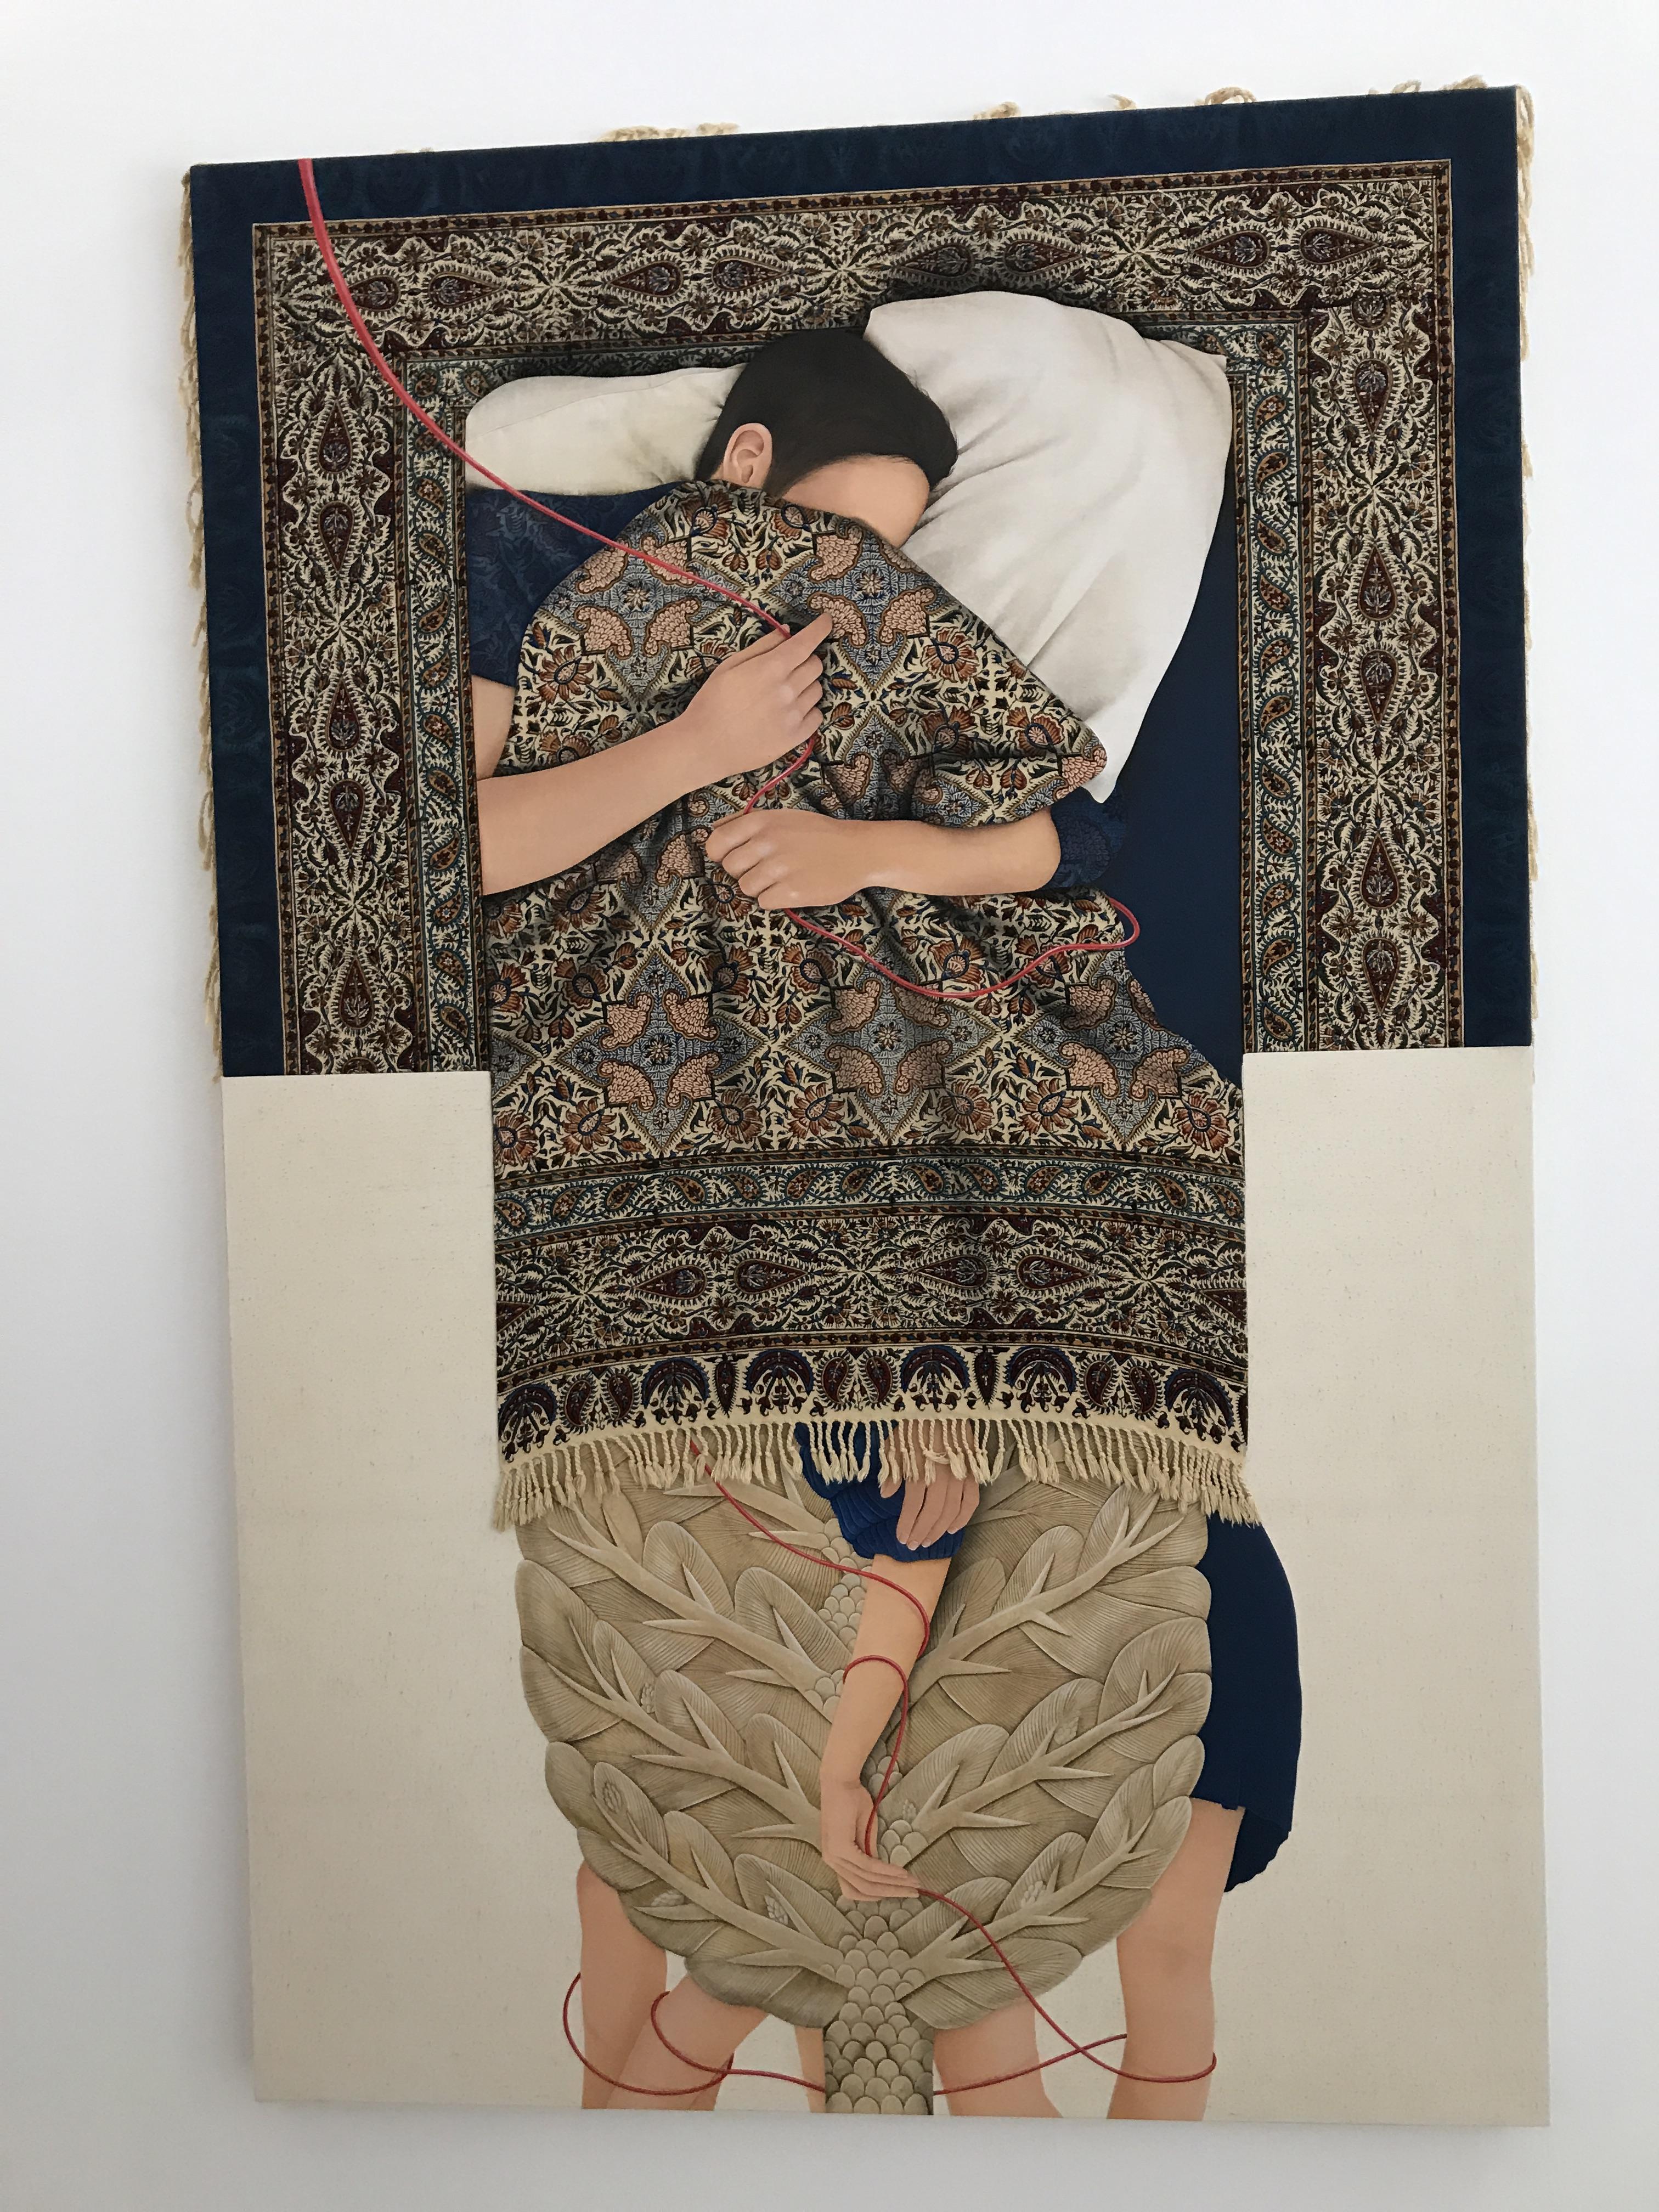 Arghavan Khosravi She Had a Dream